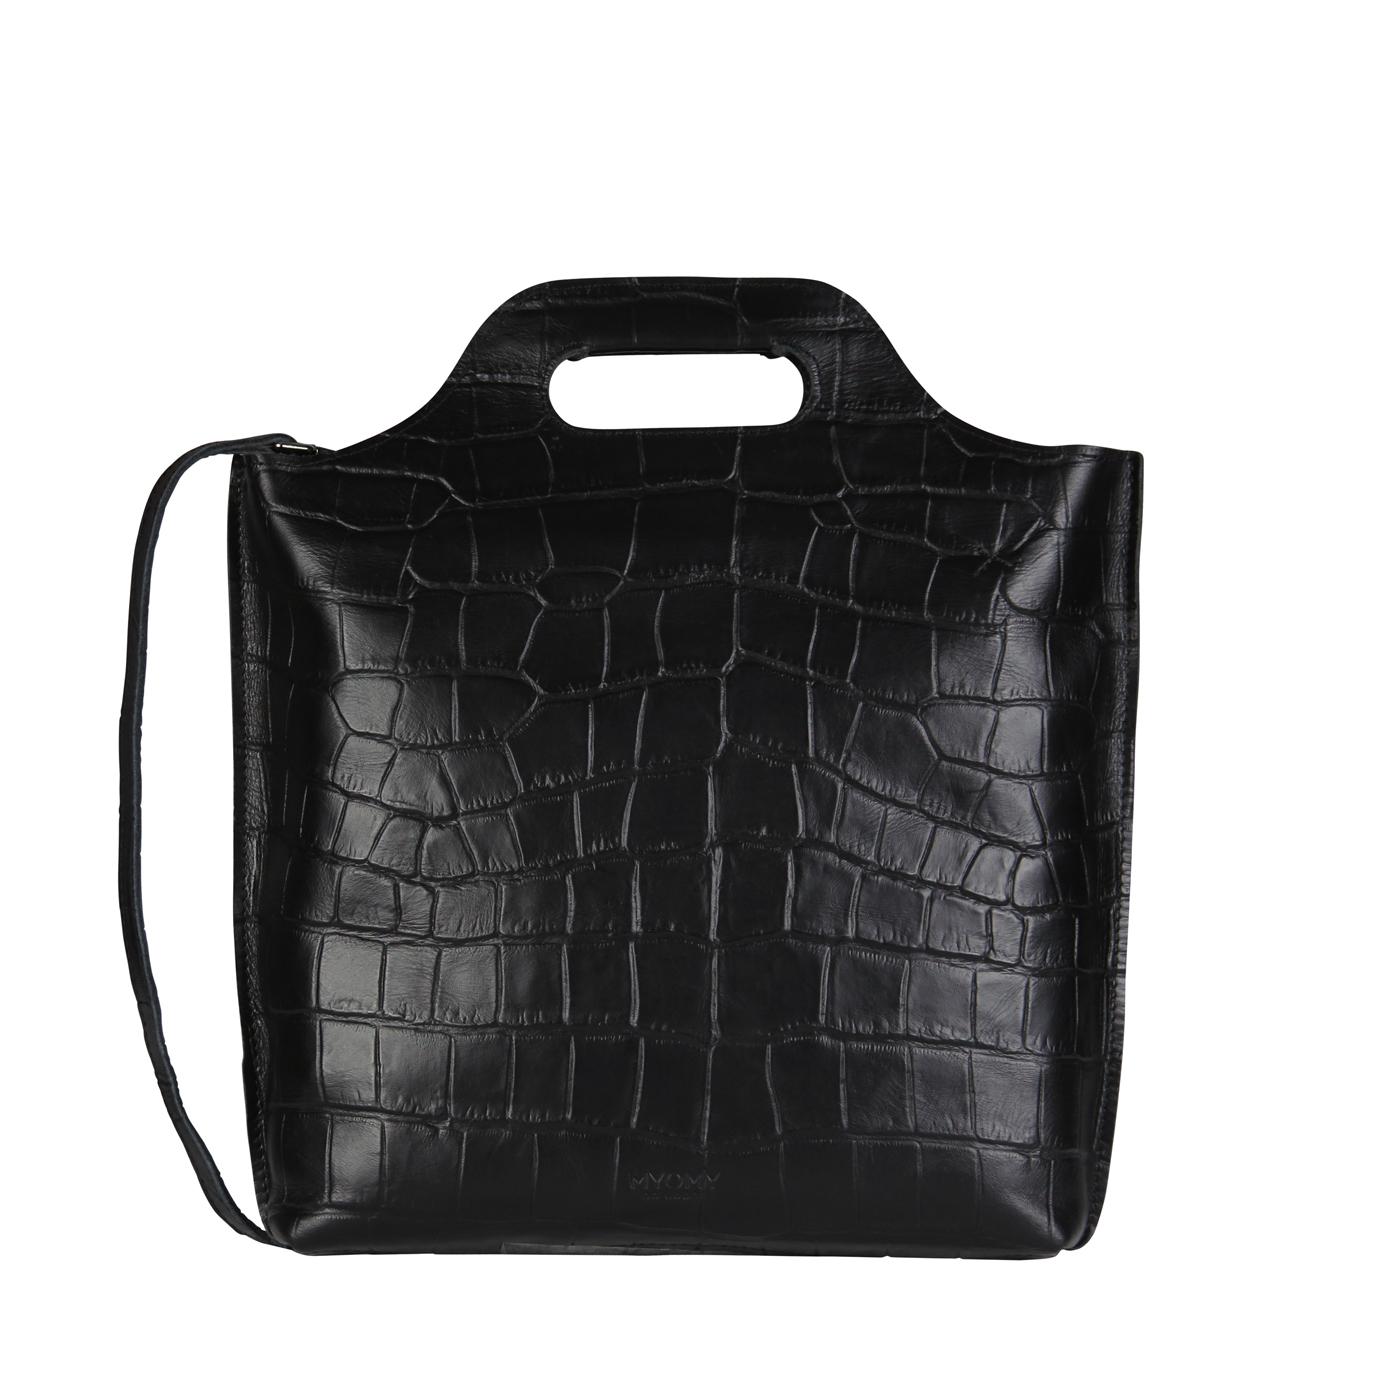 MY CARRY BAG shopper medium- croco black